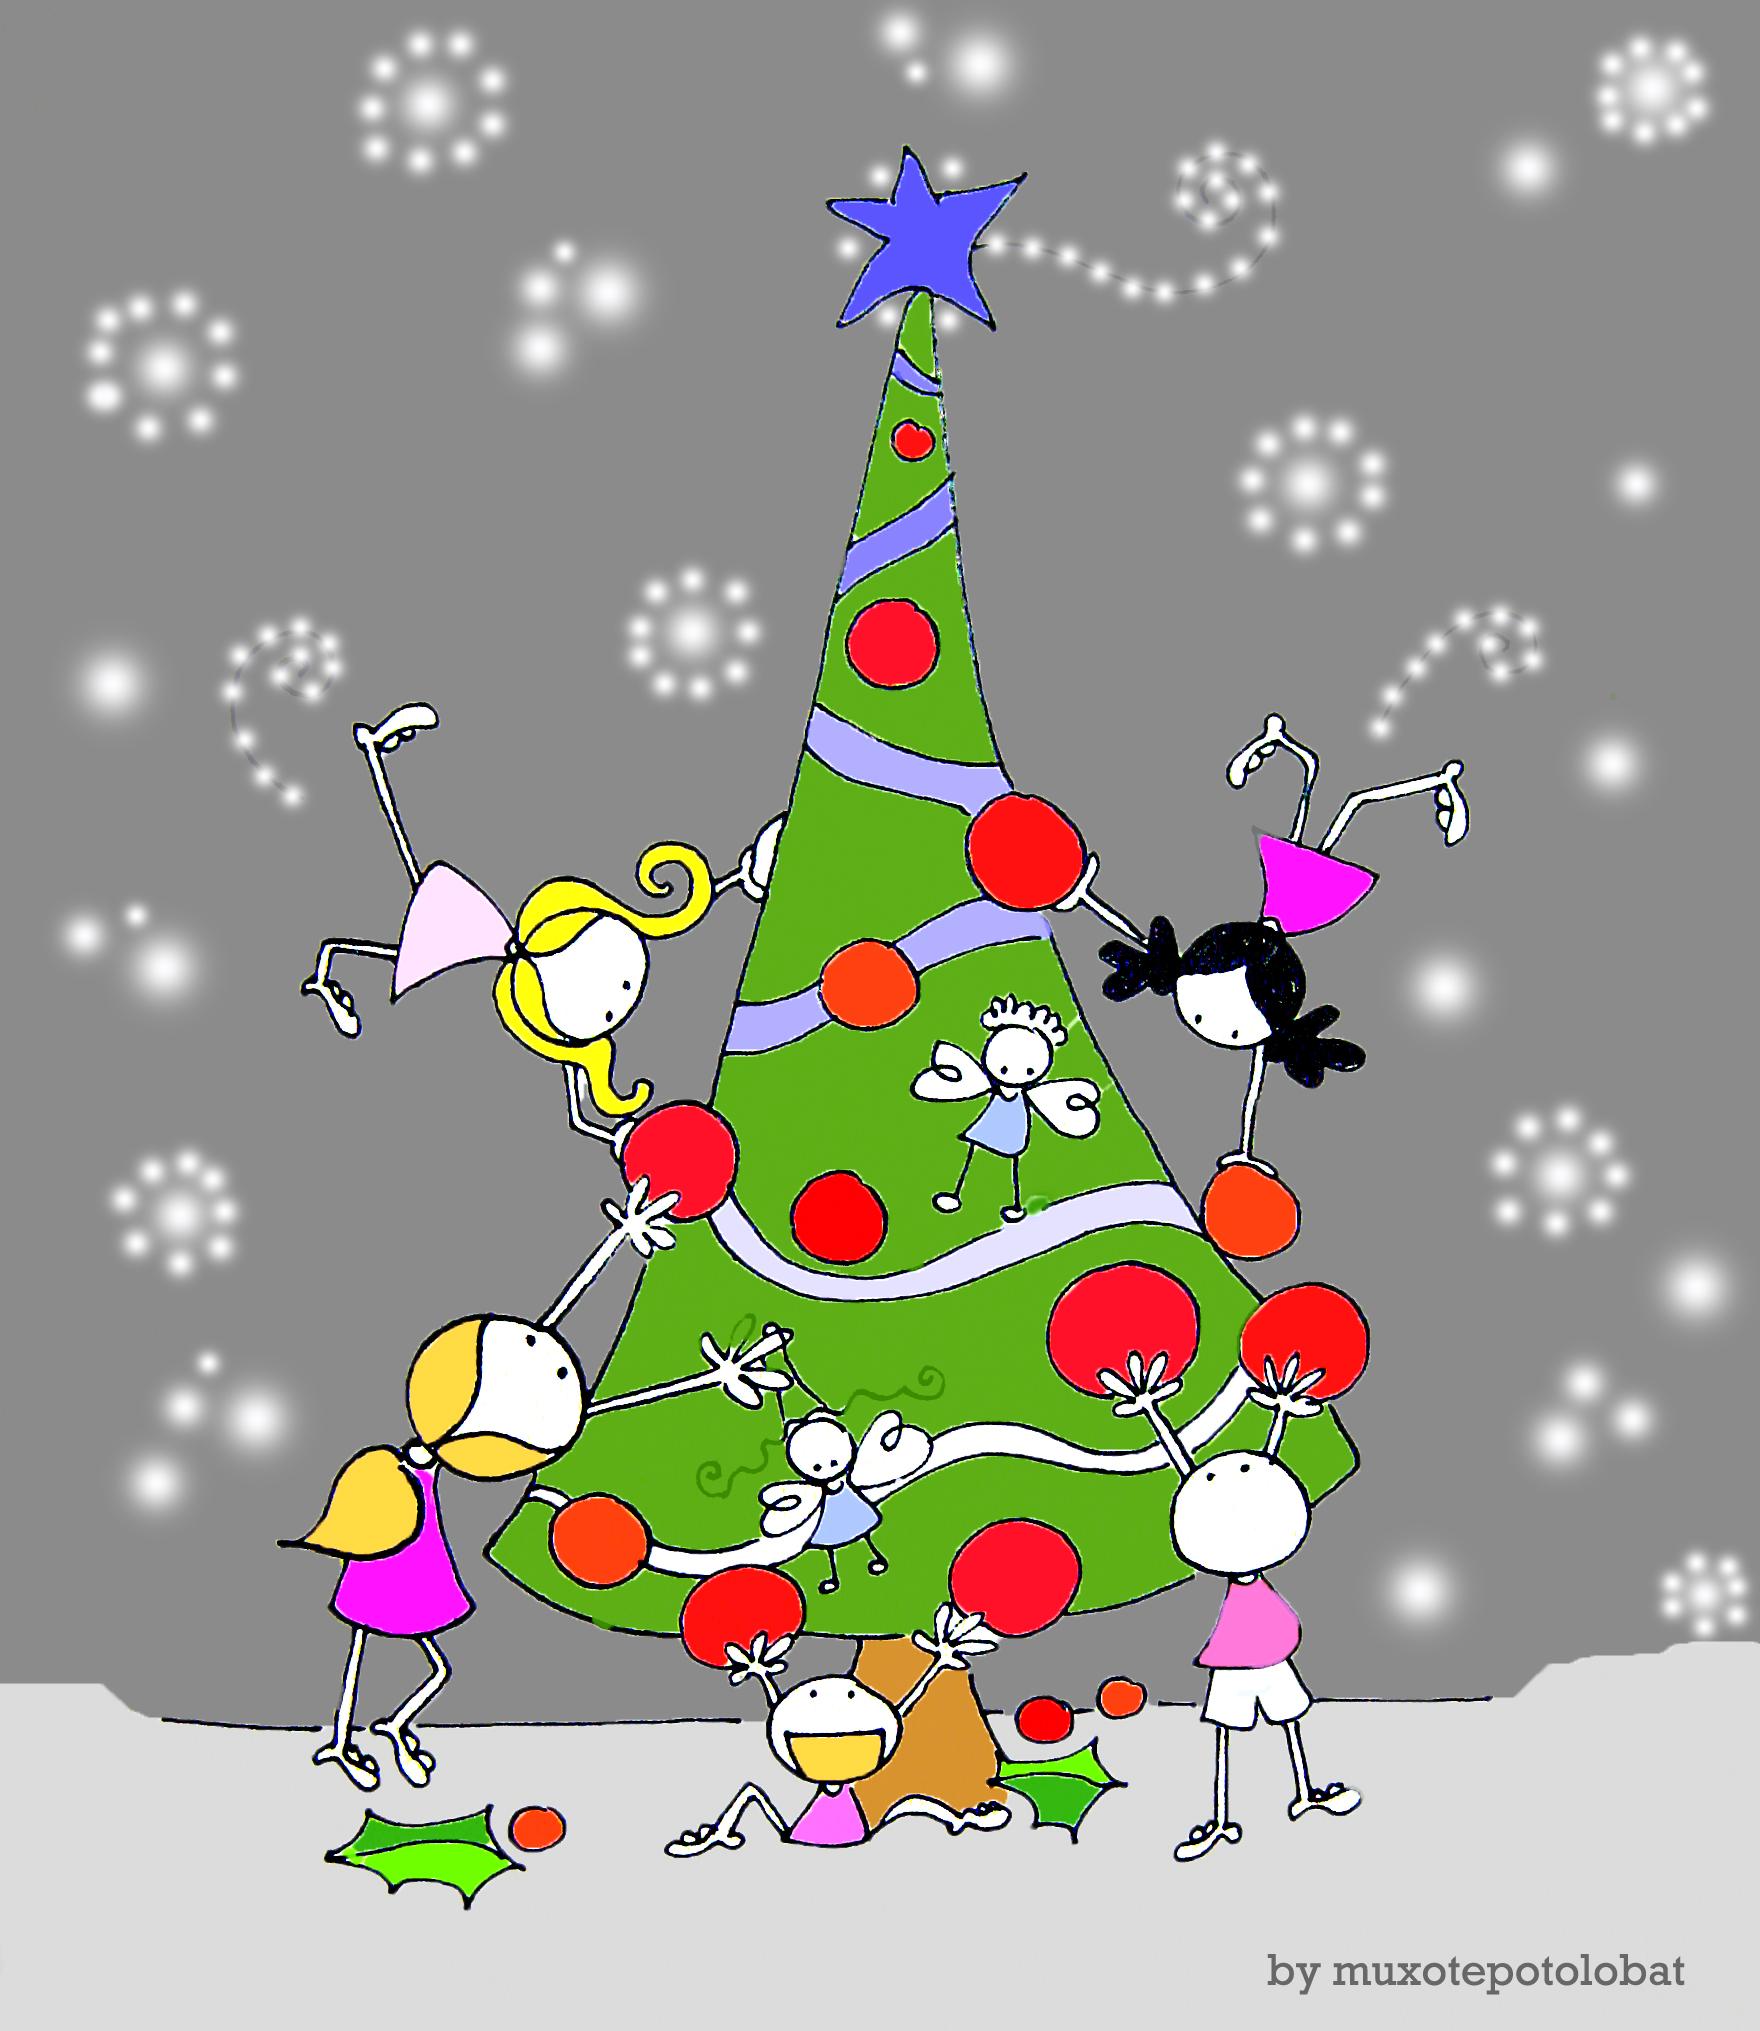 Team work (Christmas tree) - Muxote Potolo bat